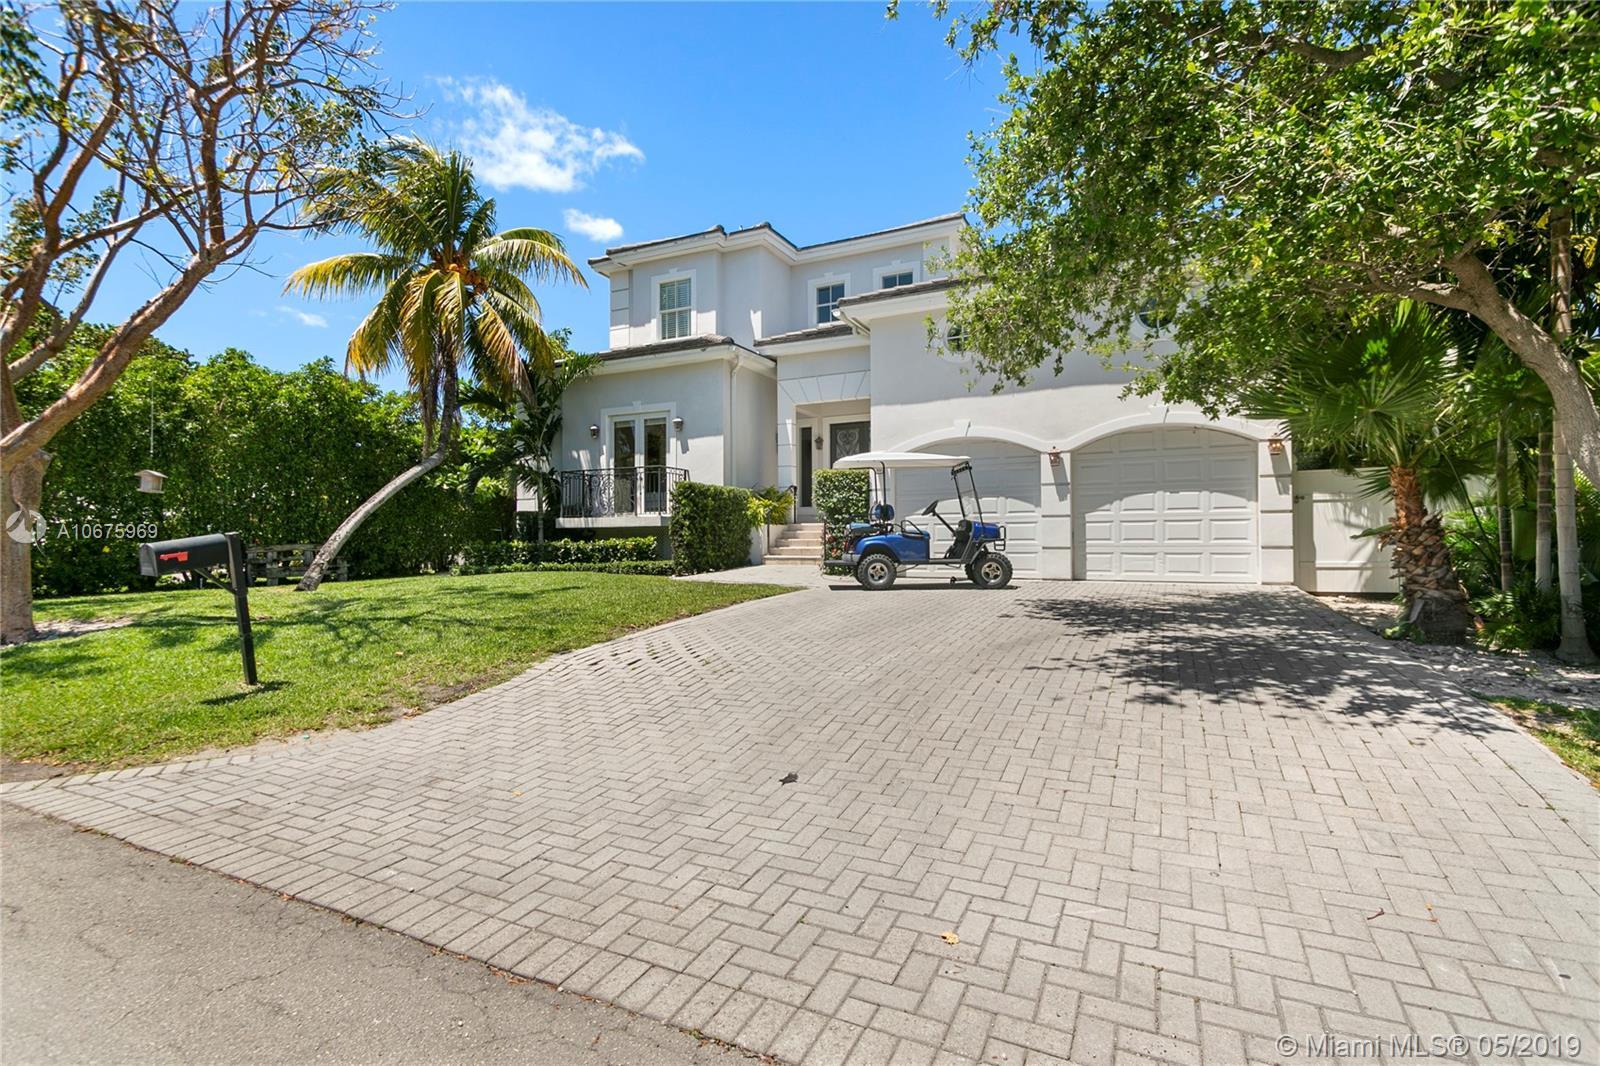 442 RIDGEWOOD RD, Key Biscayne, Florida